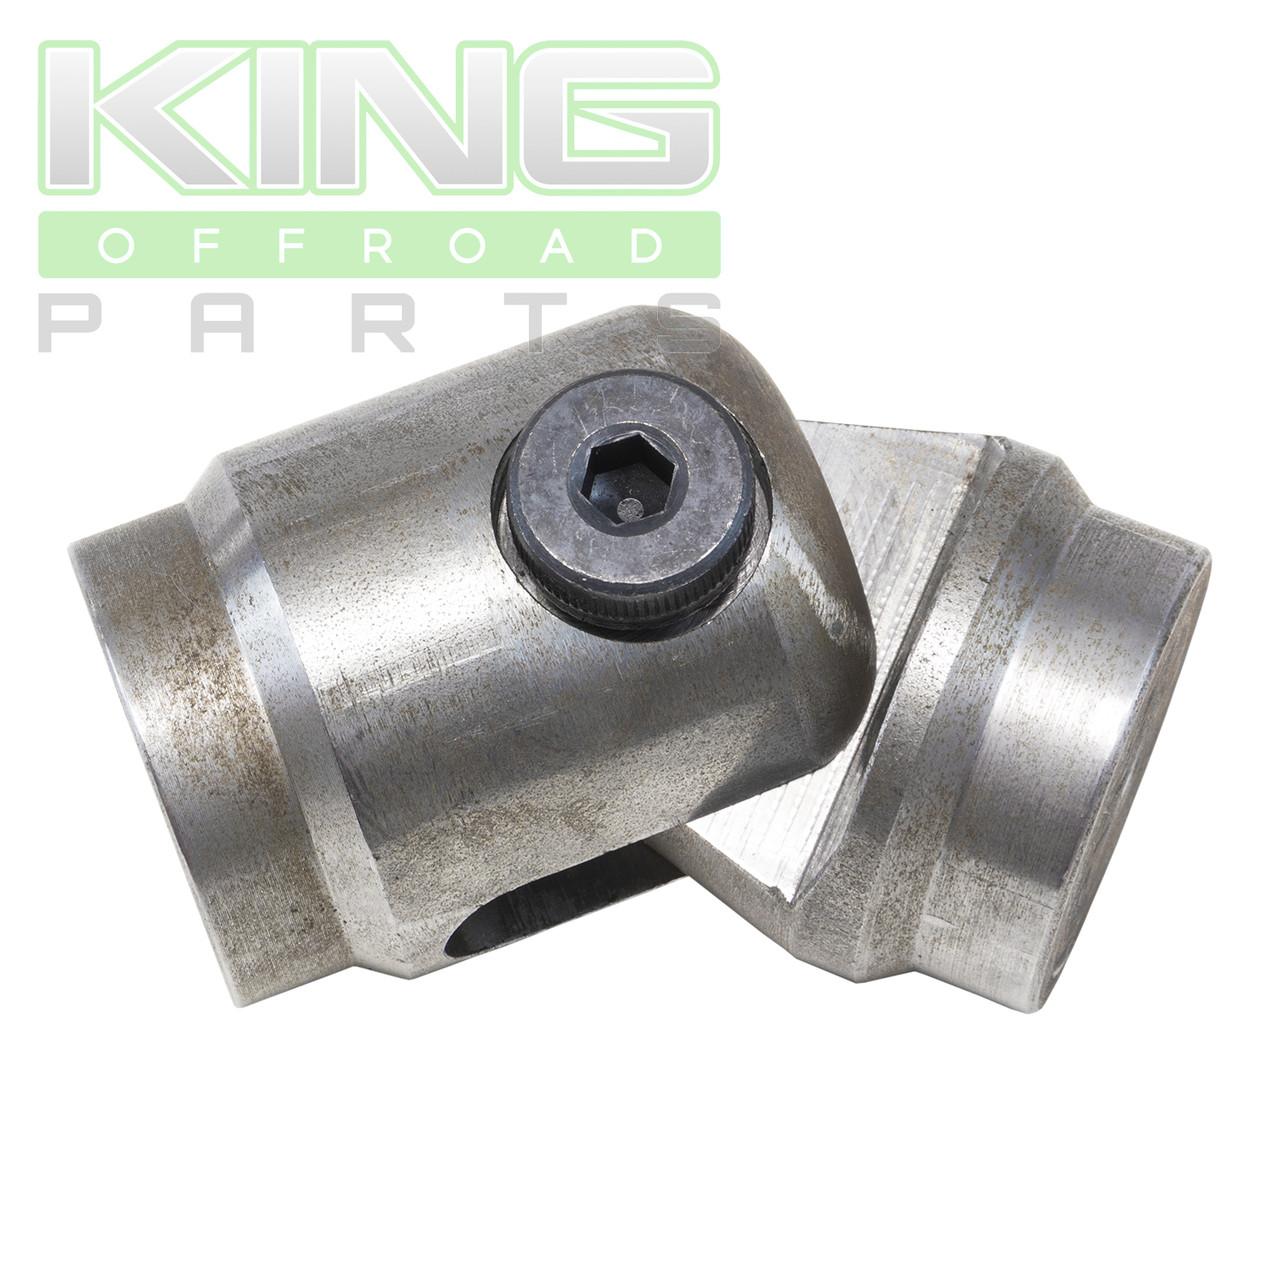 Polaris RZR Cage Bung XP 1000 , CAN-AM YAMAHA UNIVERSAL DOOR HINGE for 1 5  tubing